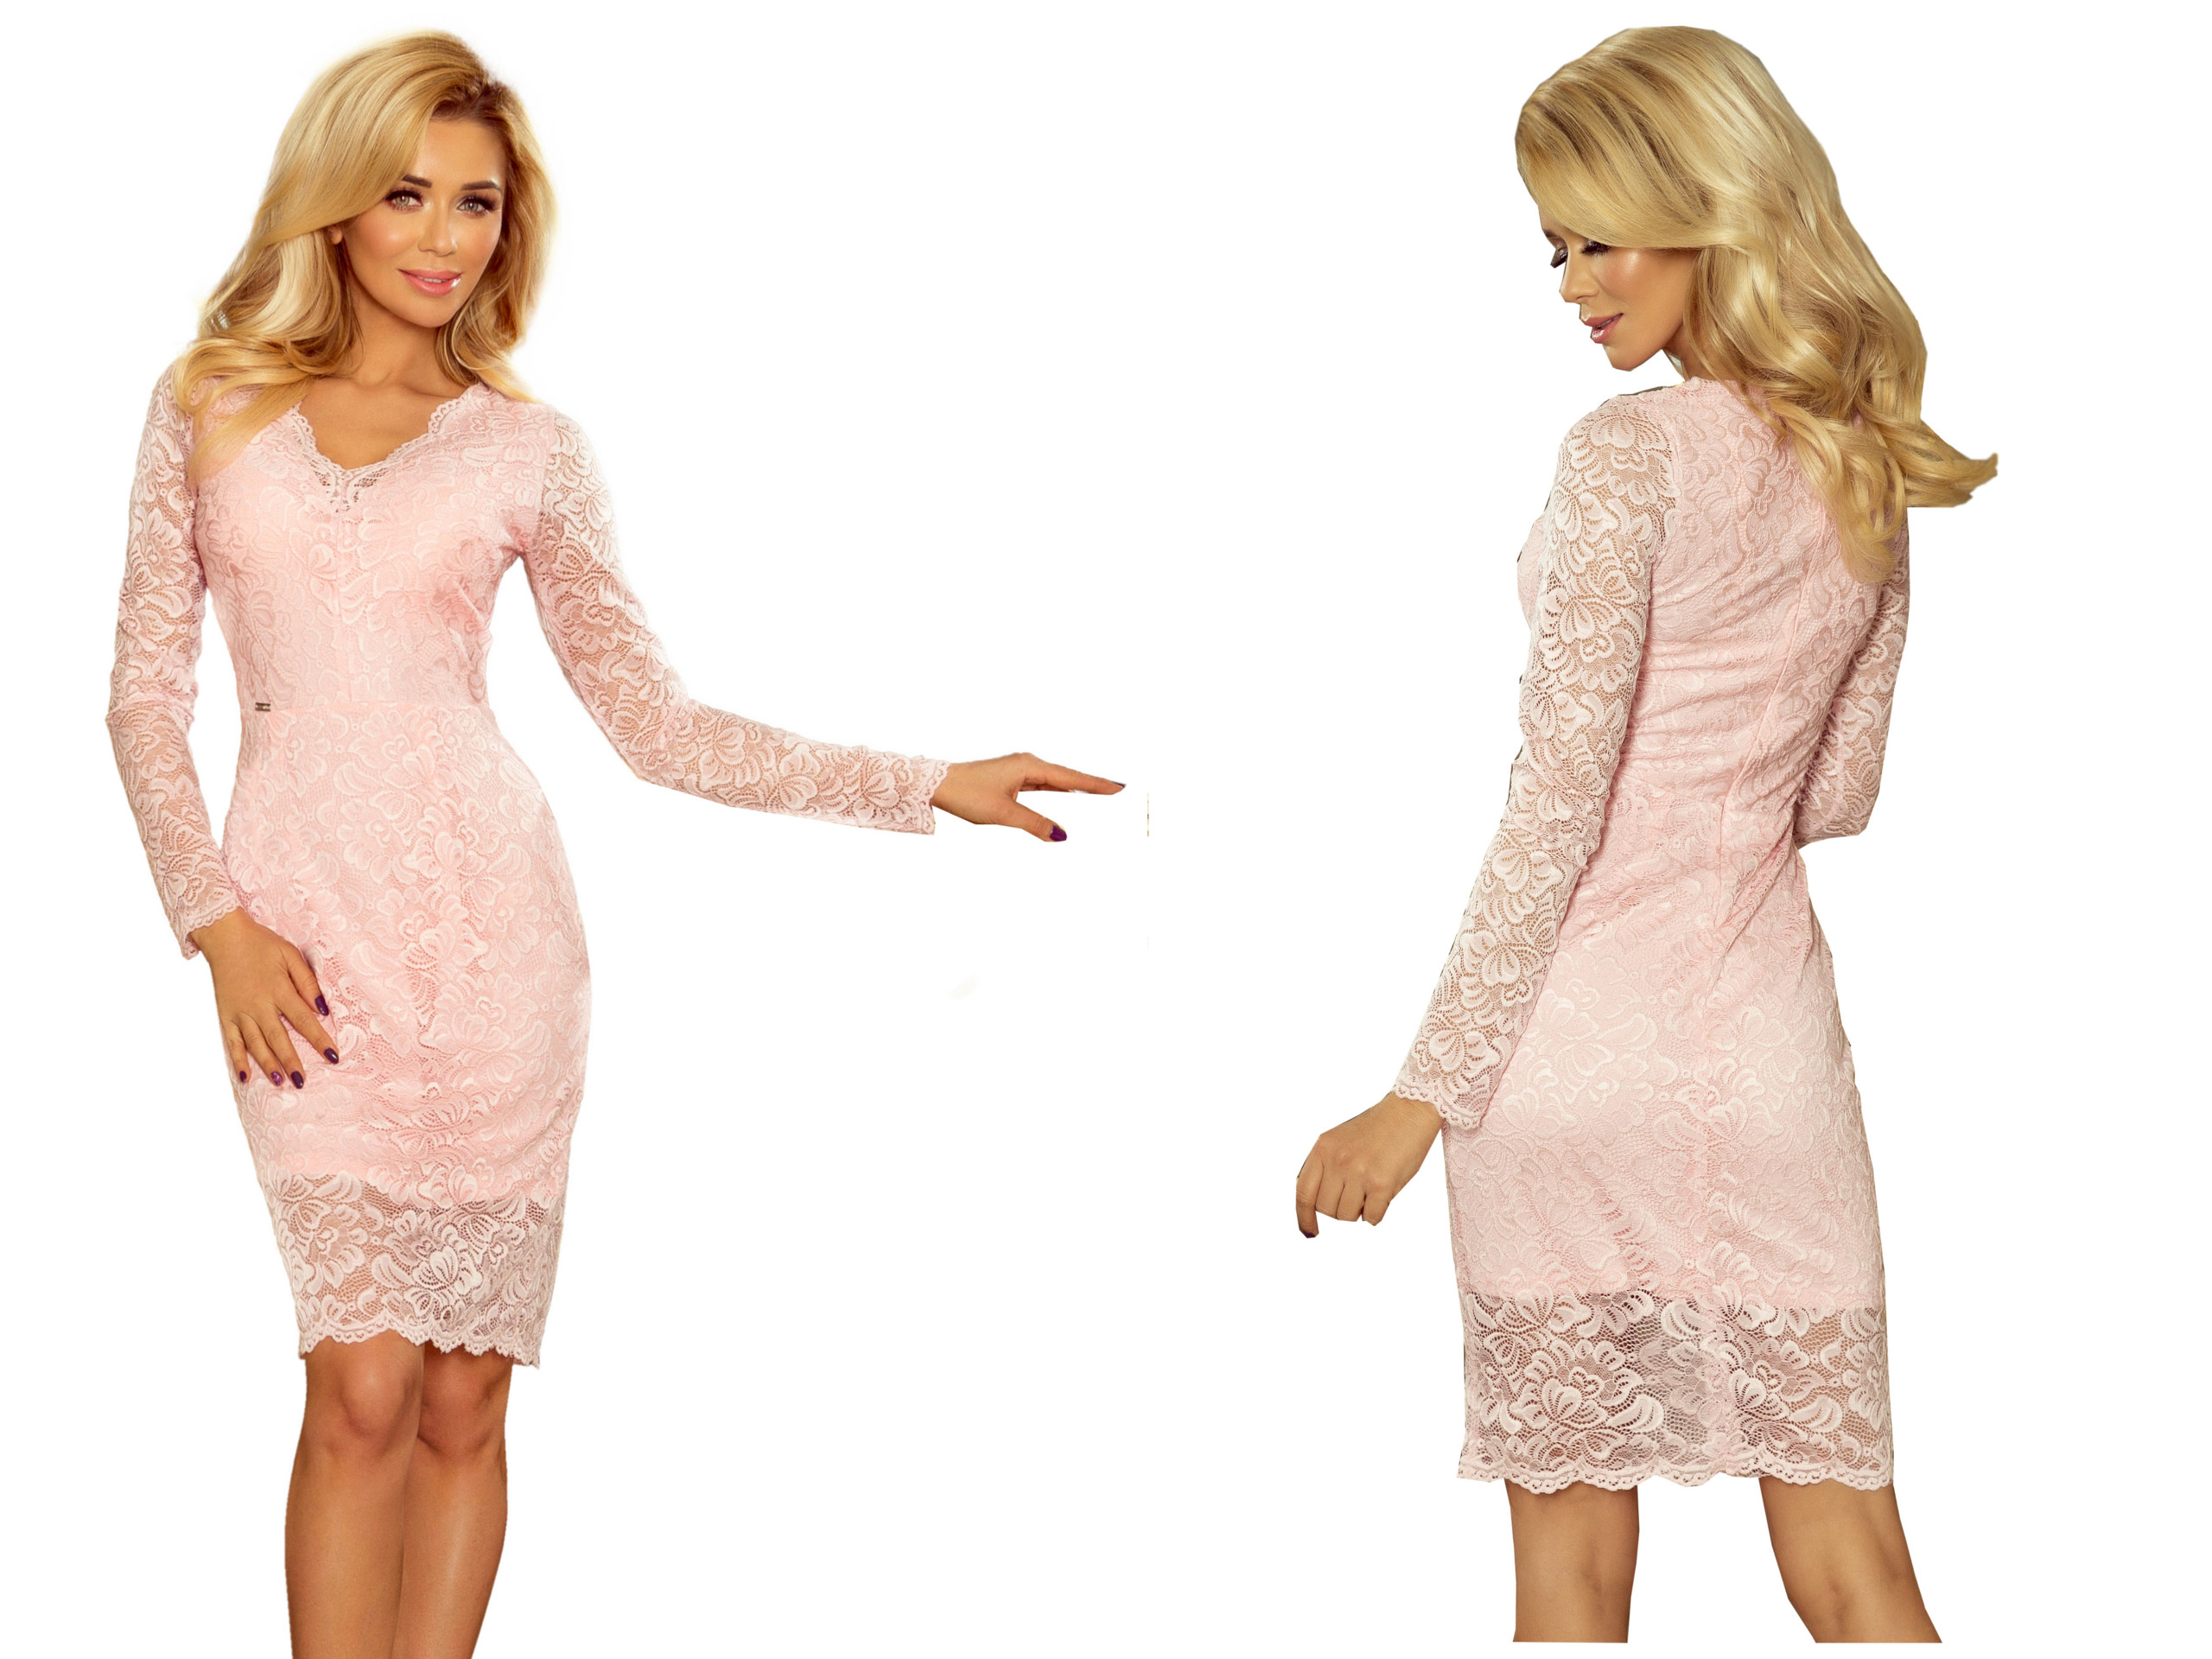 d97e3558bb ELEGANCKA Sukienka NA WESELE KORONKOWA 170-4 S 36 7378688491 - Allegro.pl